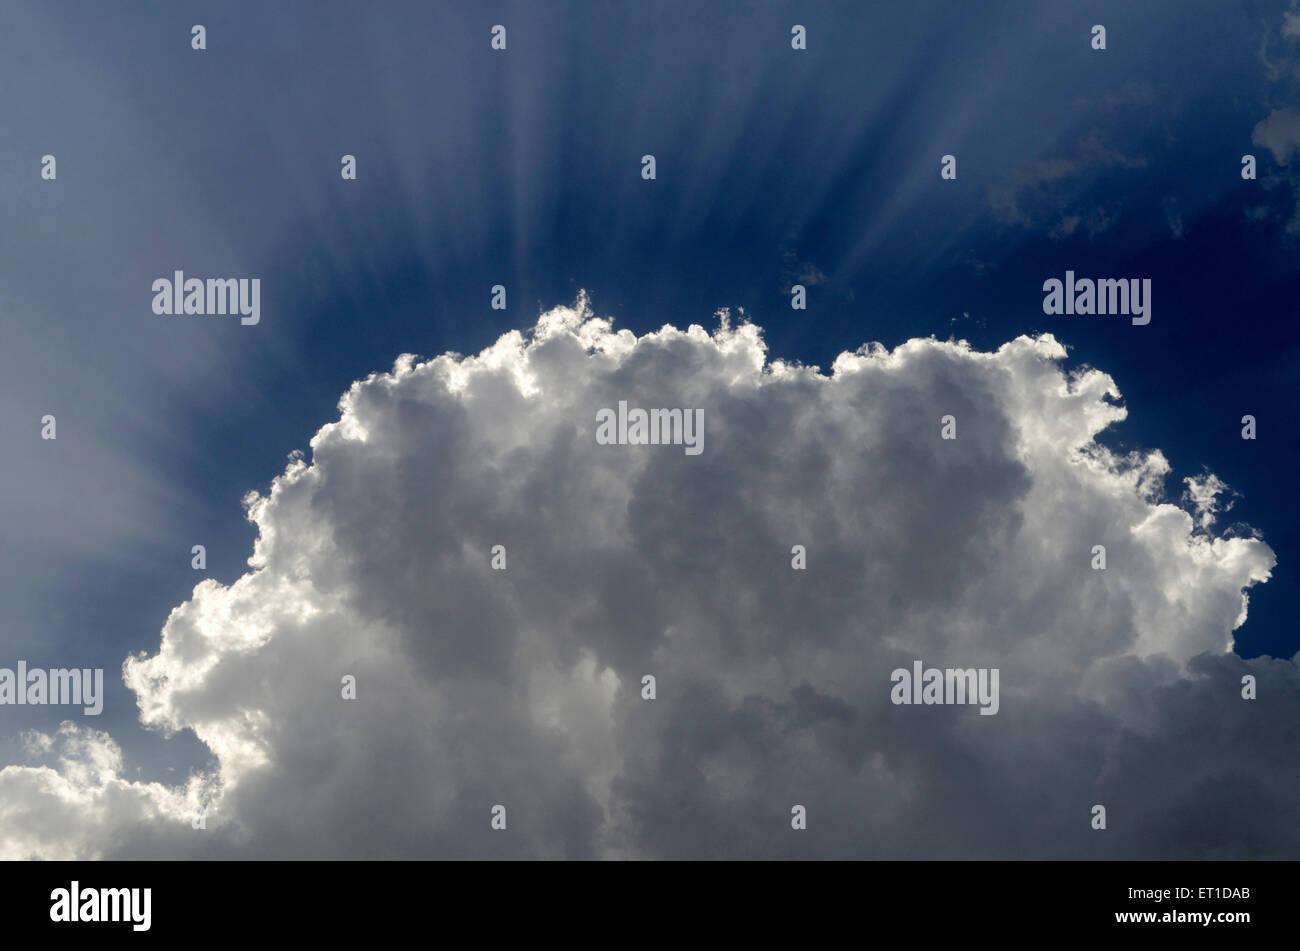 Sunrays behind white cloud in moon light Jaipur Rajasthan India - Stock Image